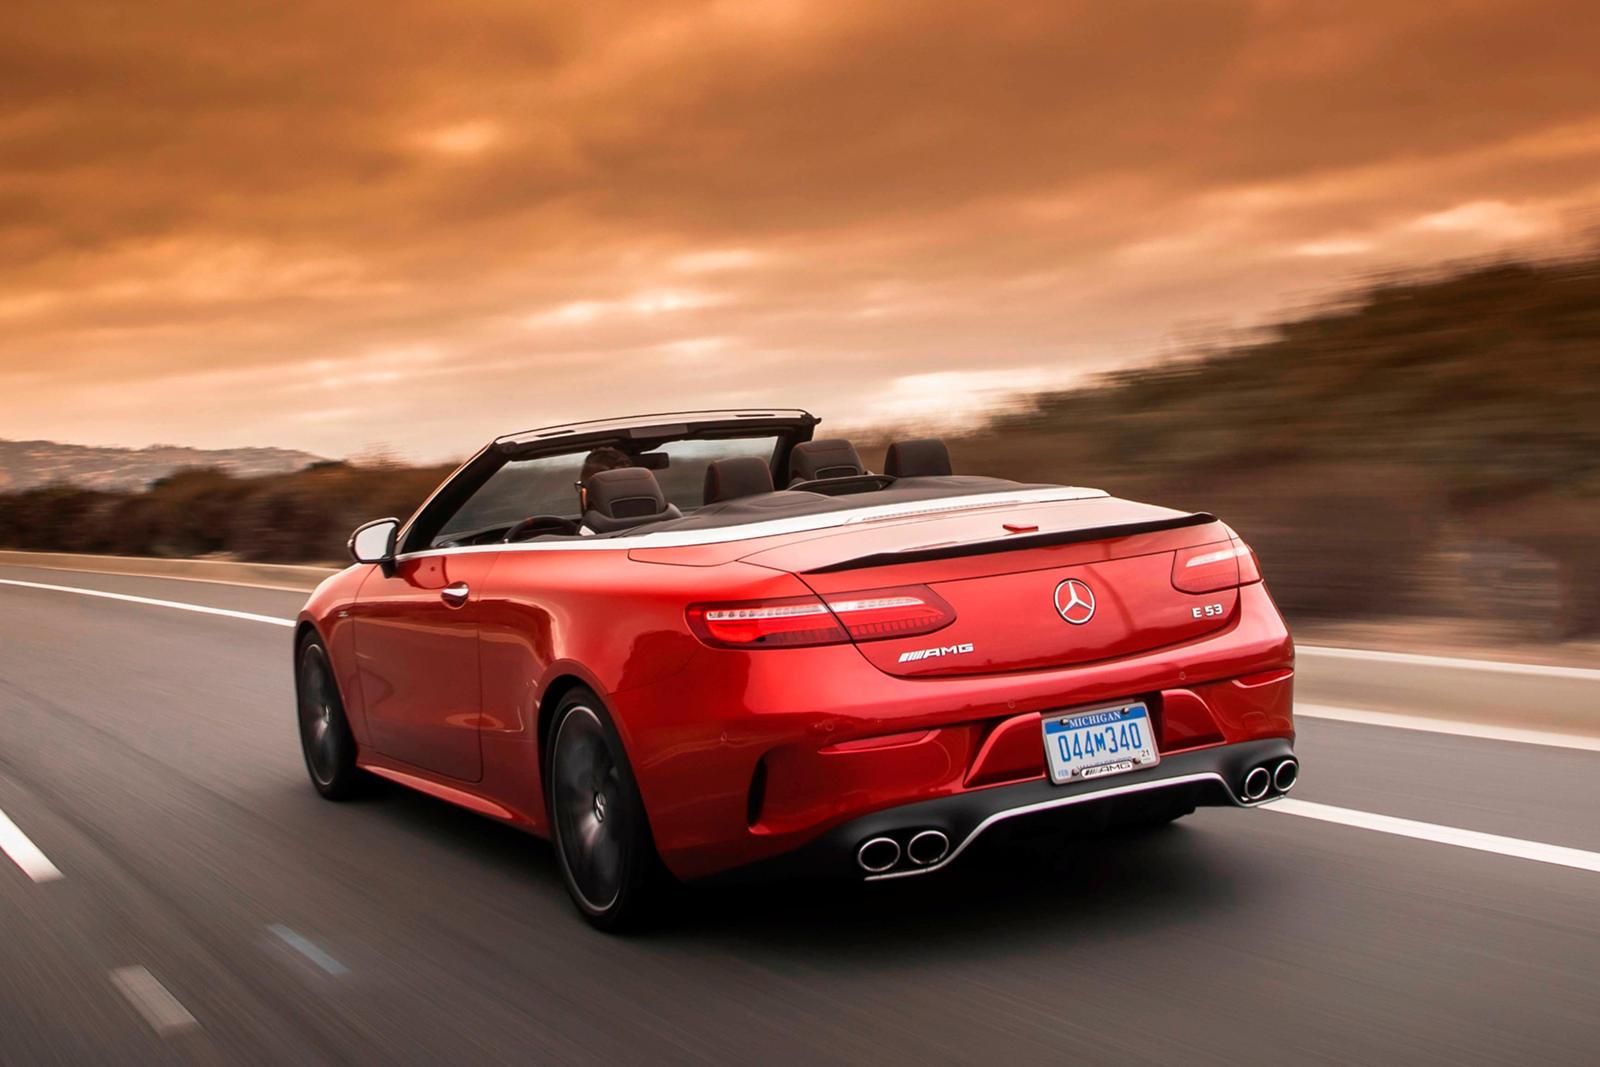 2021 mercedes-amg e53 convertible: review, trims, specs